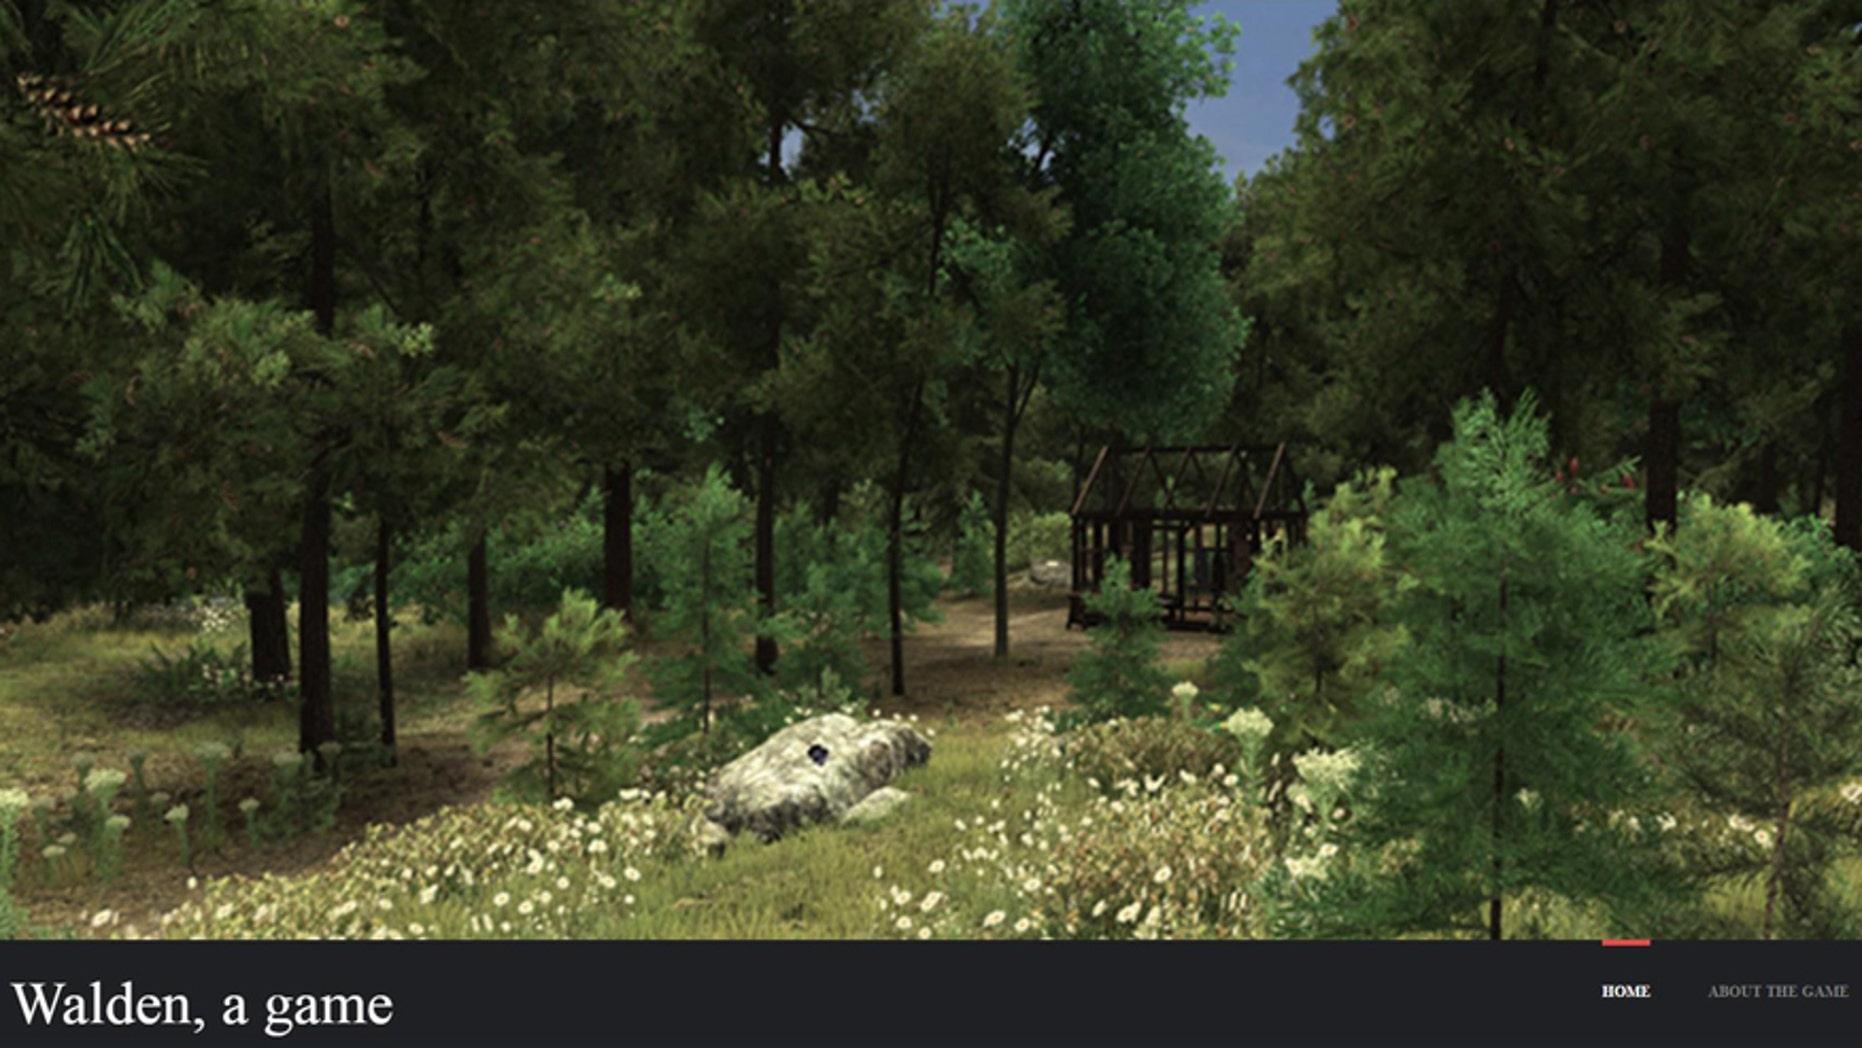 (Screenshot from www.waldengame.com)